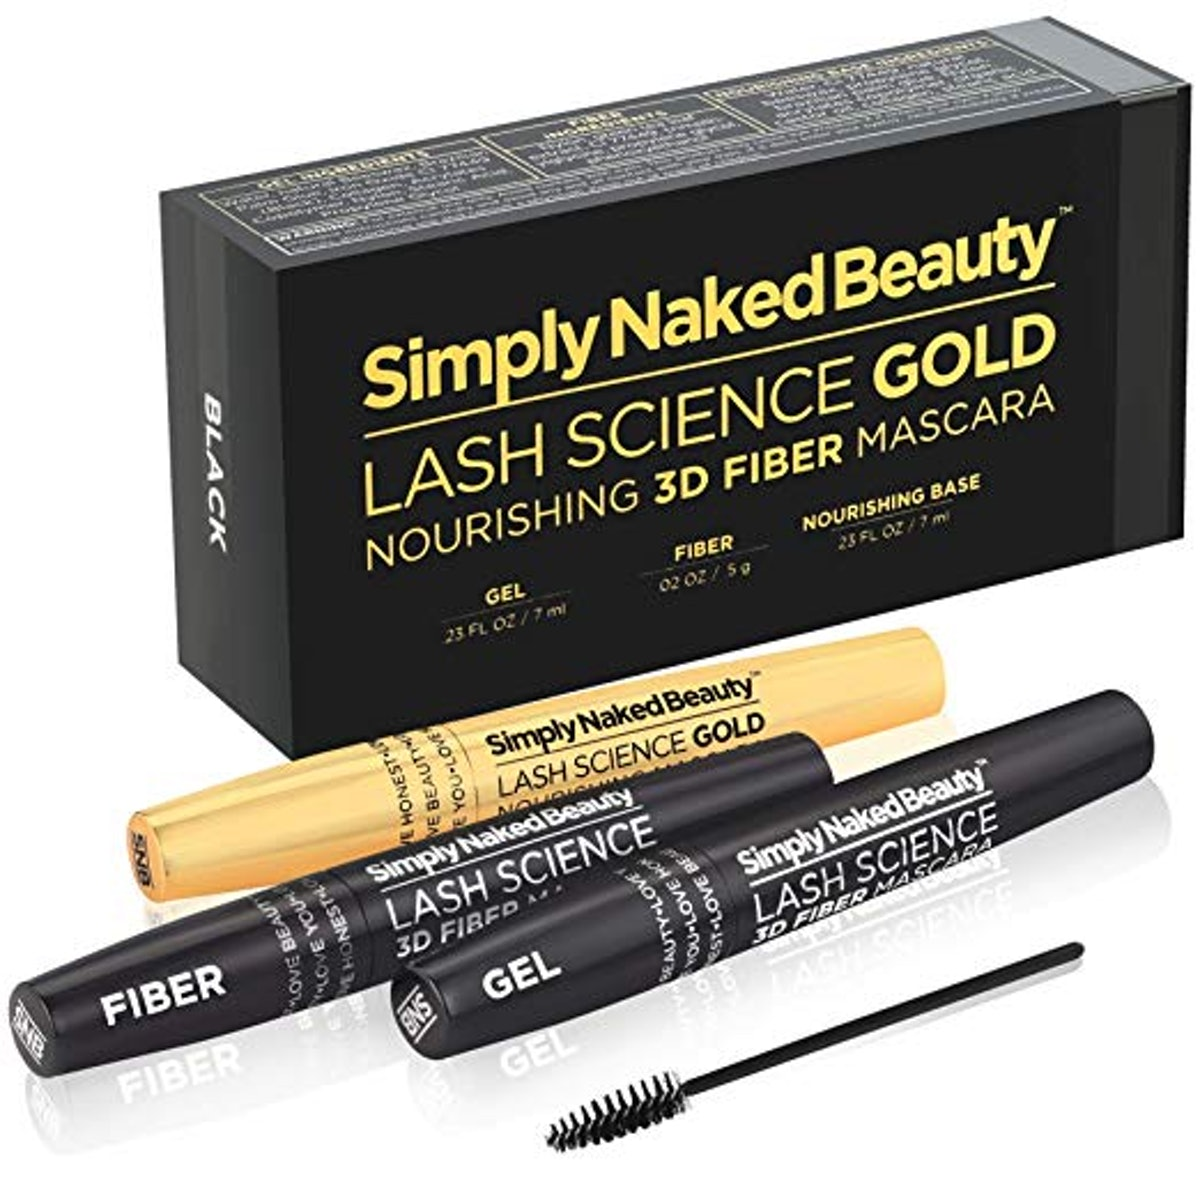 Simply Naked Beauty 3D Fiber Lash Mascara with Growth Enhancing Serum